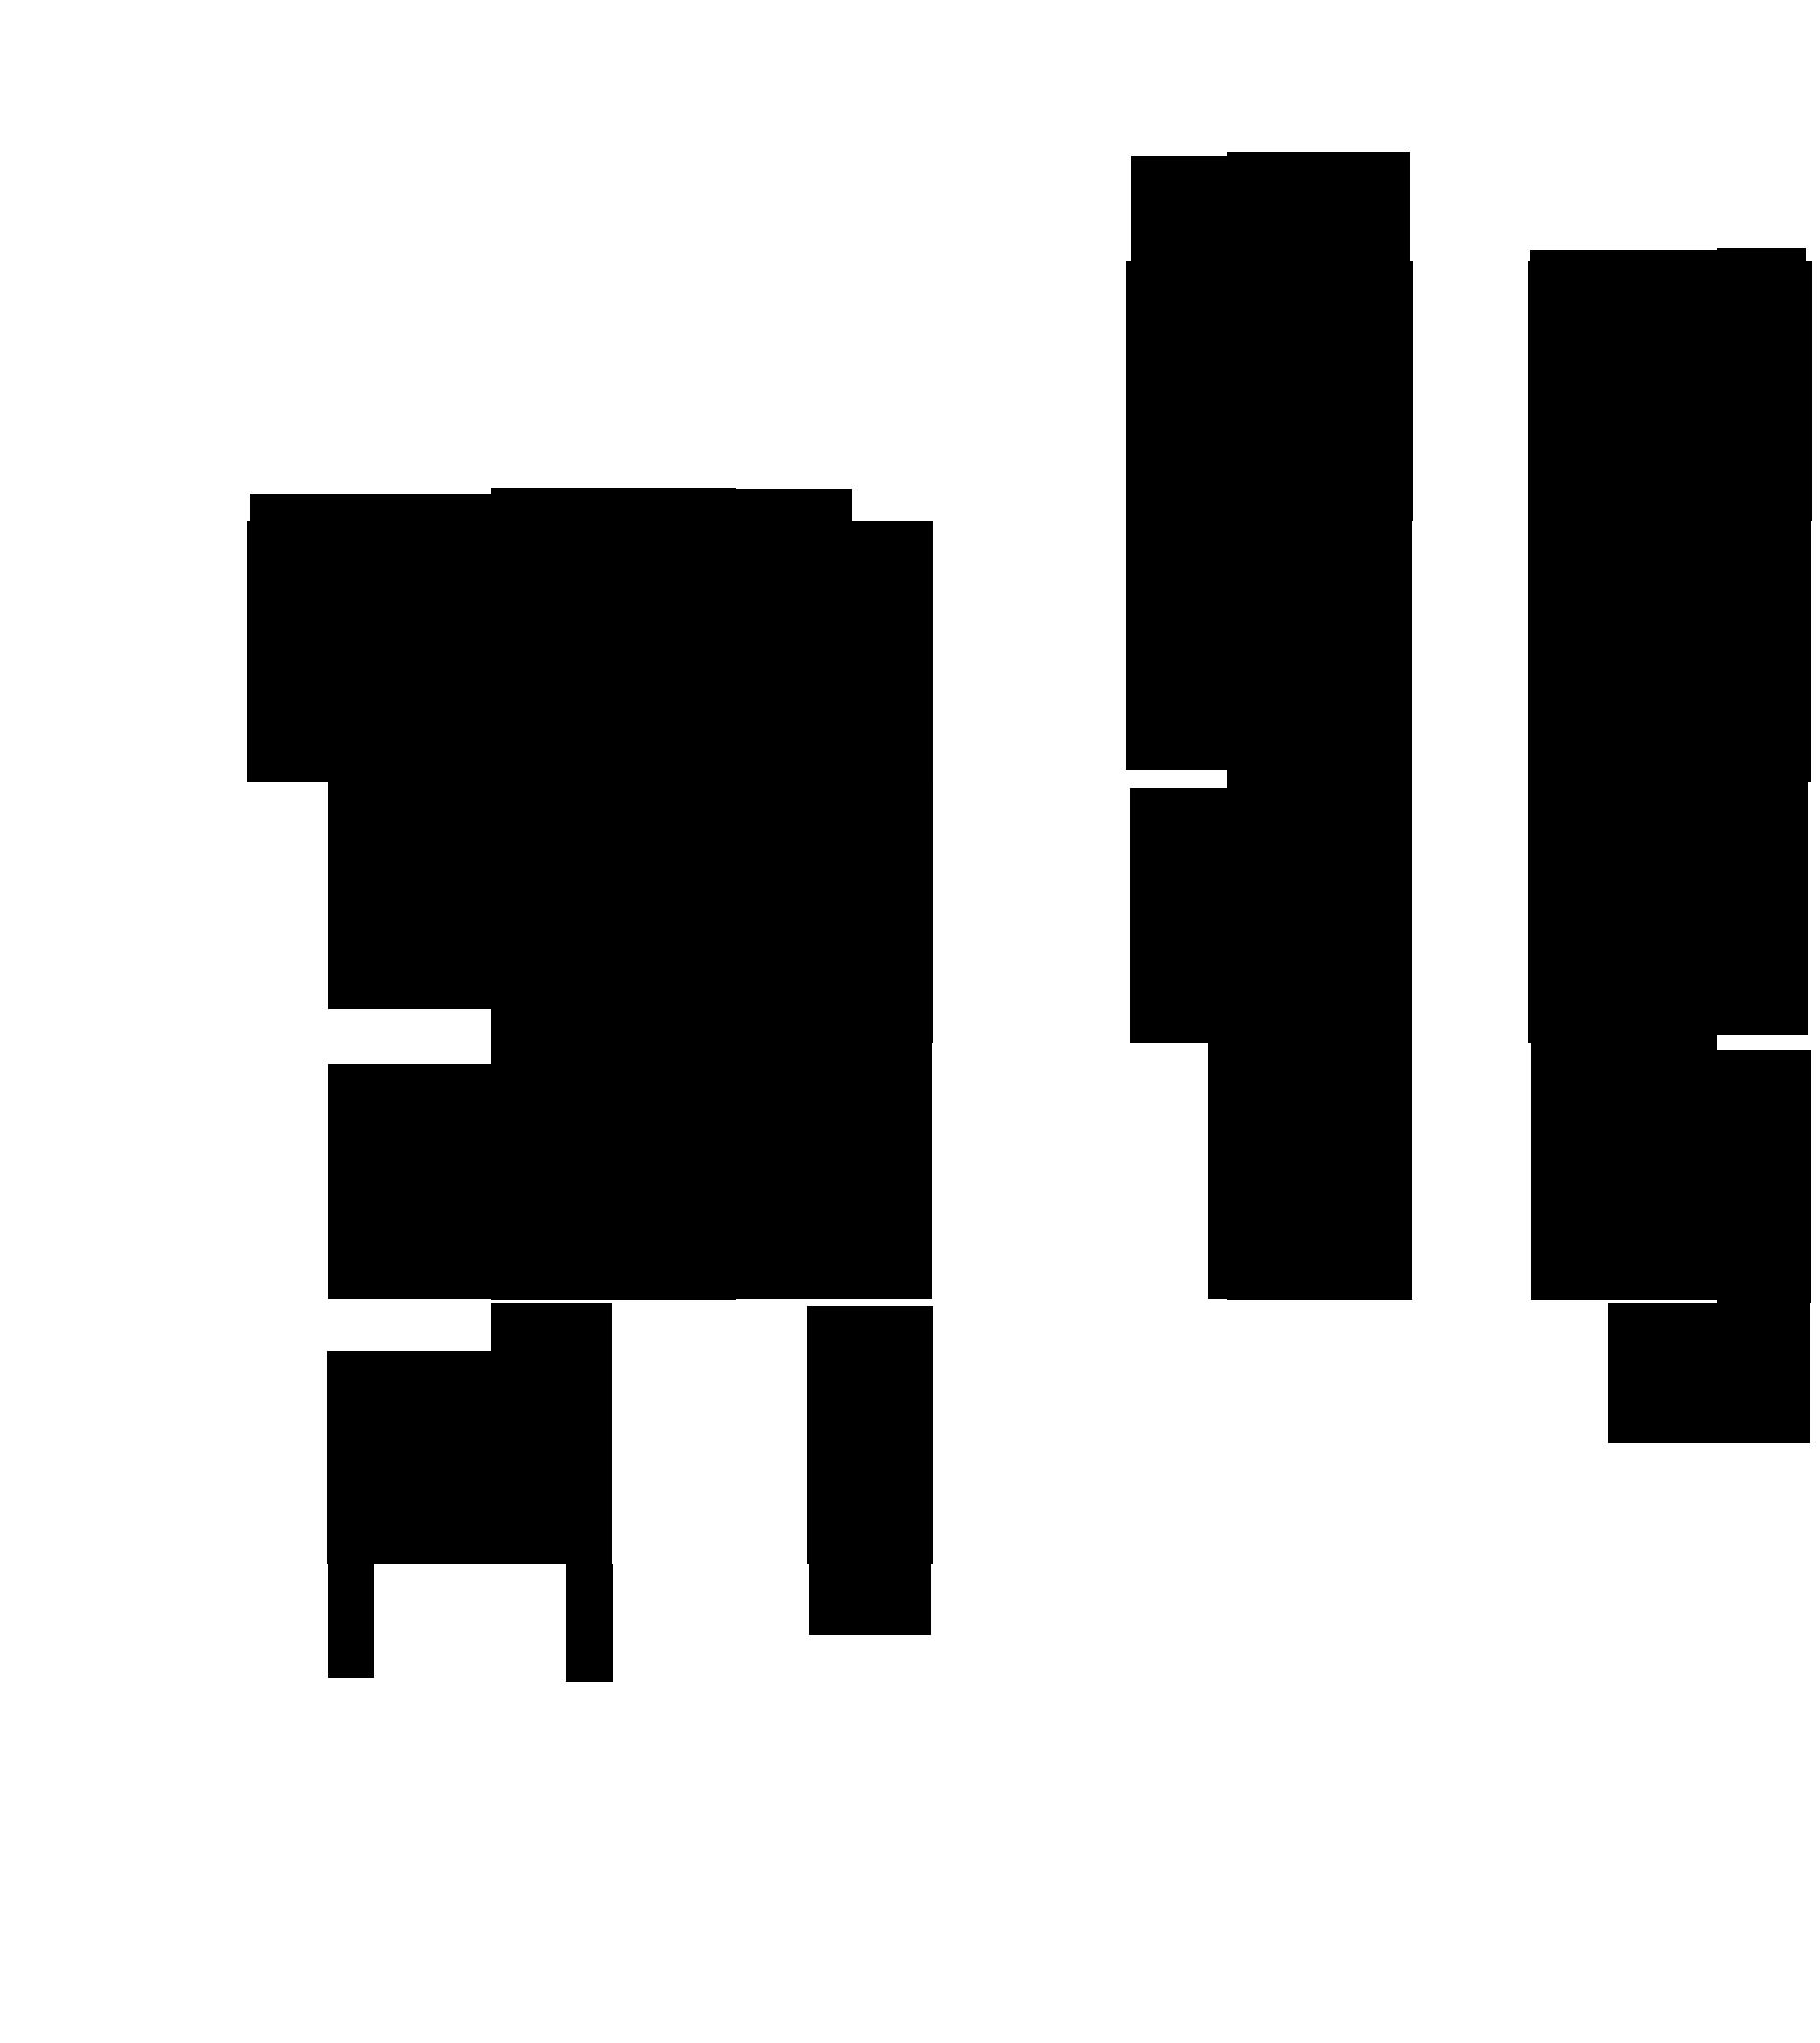 岡野詩130823-2